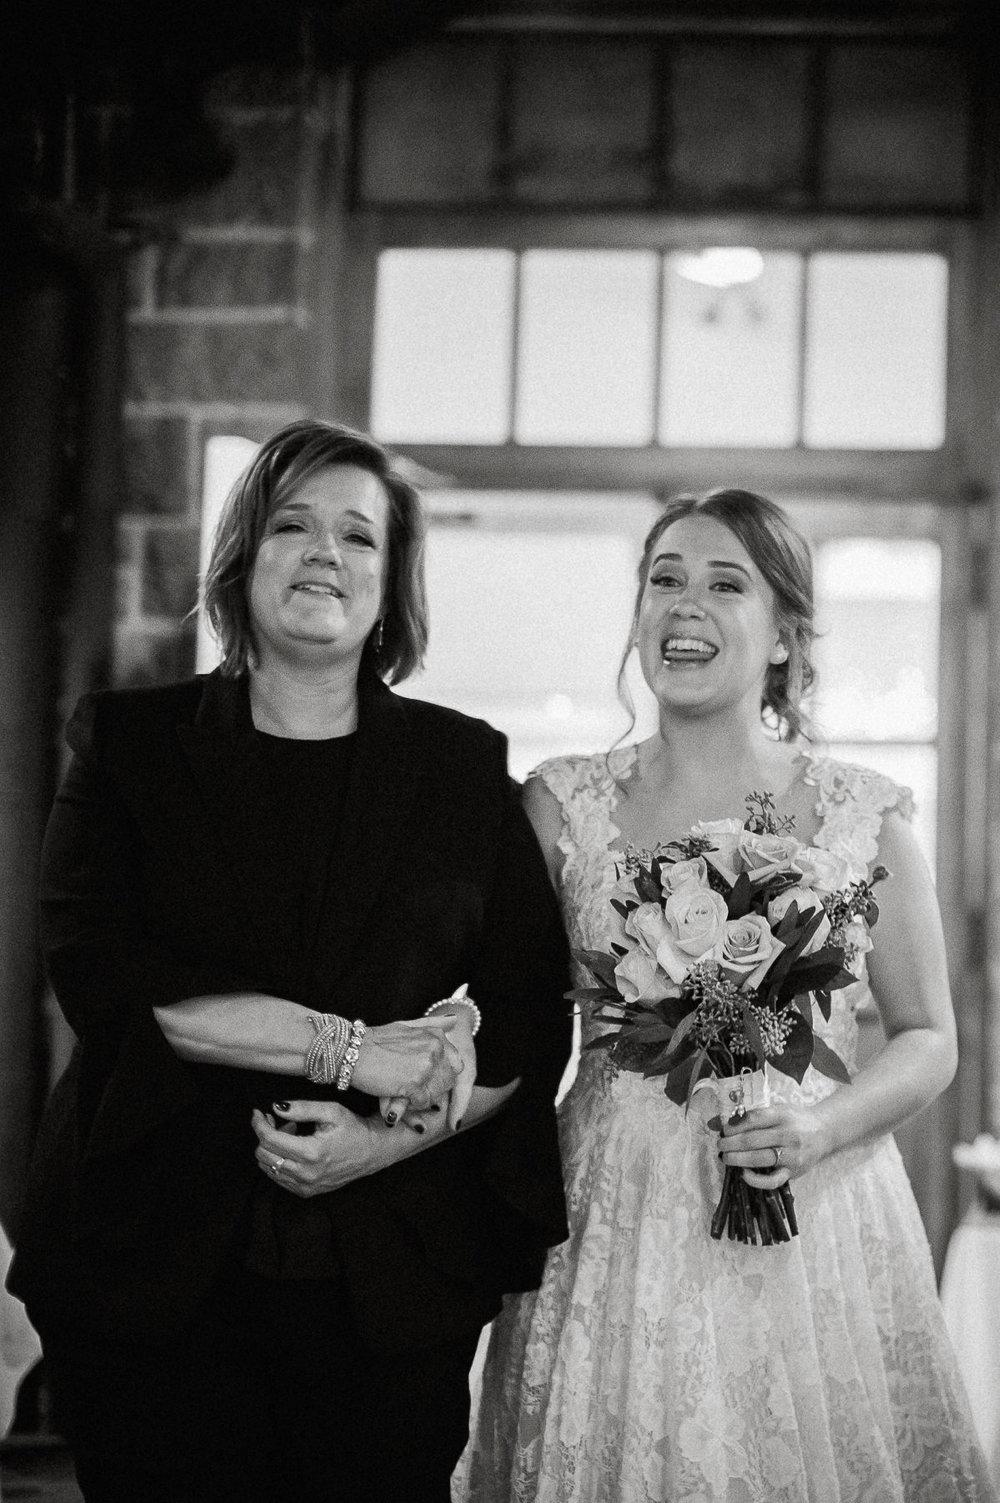 breighton-and-basette-photography-copyrighted-image-blog-amanda-and-eric-wedding-076.jpg